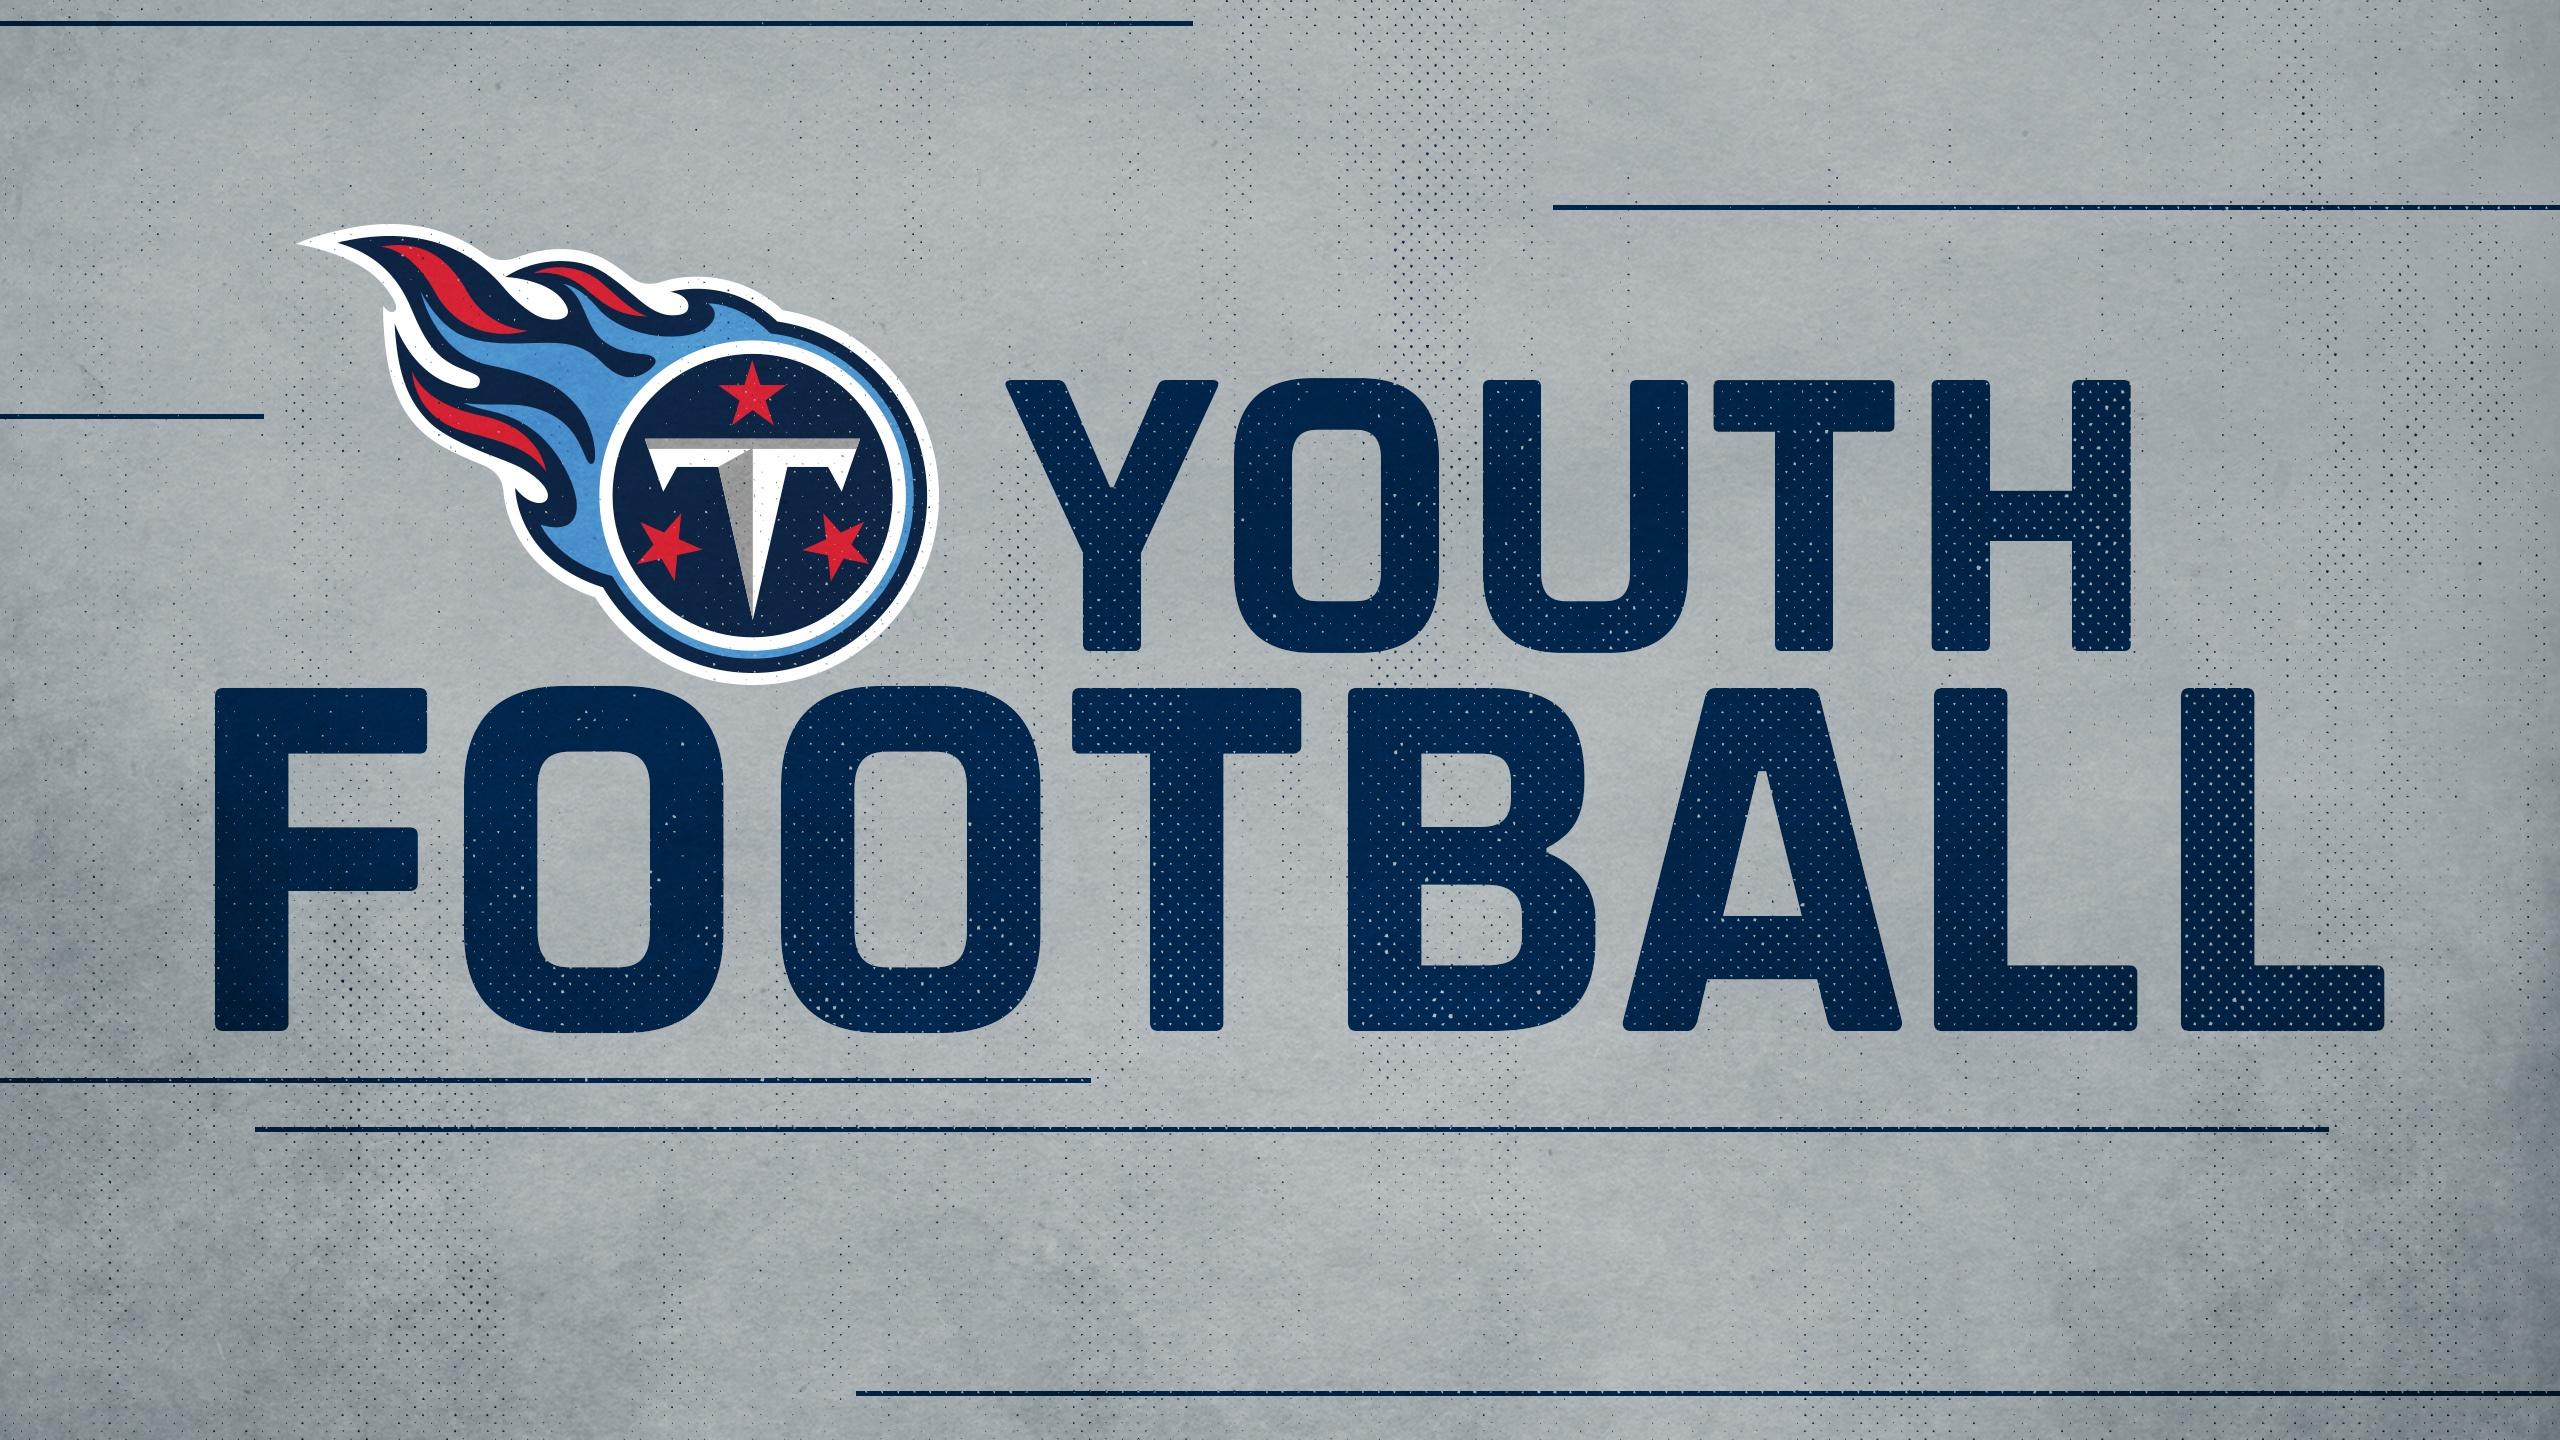 Youth Football Ticket Program